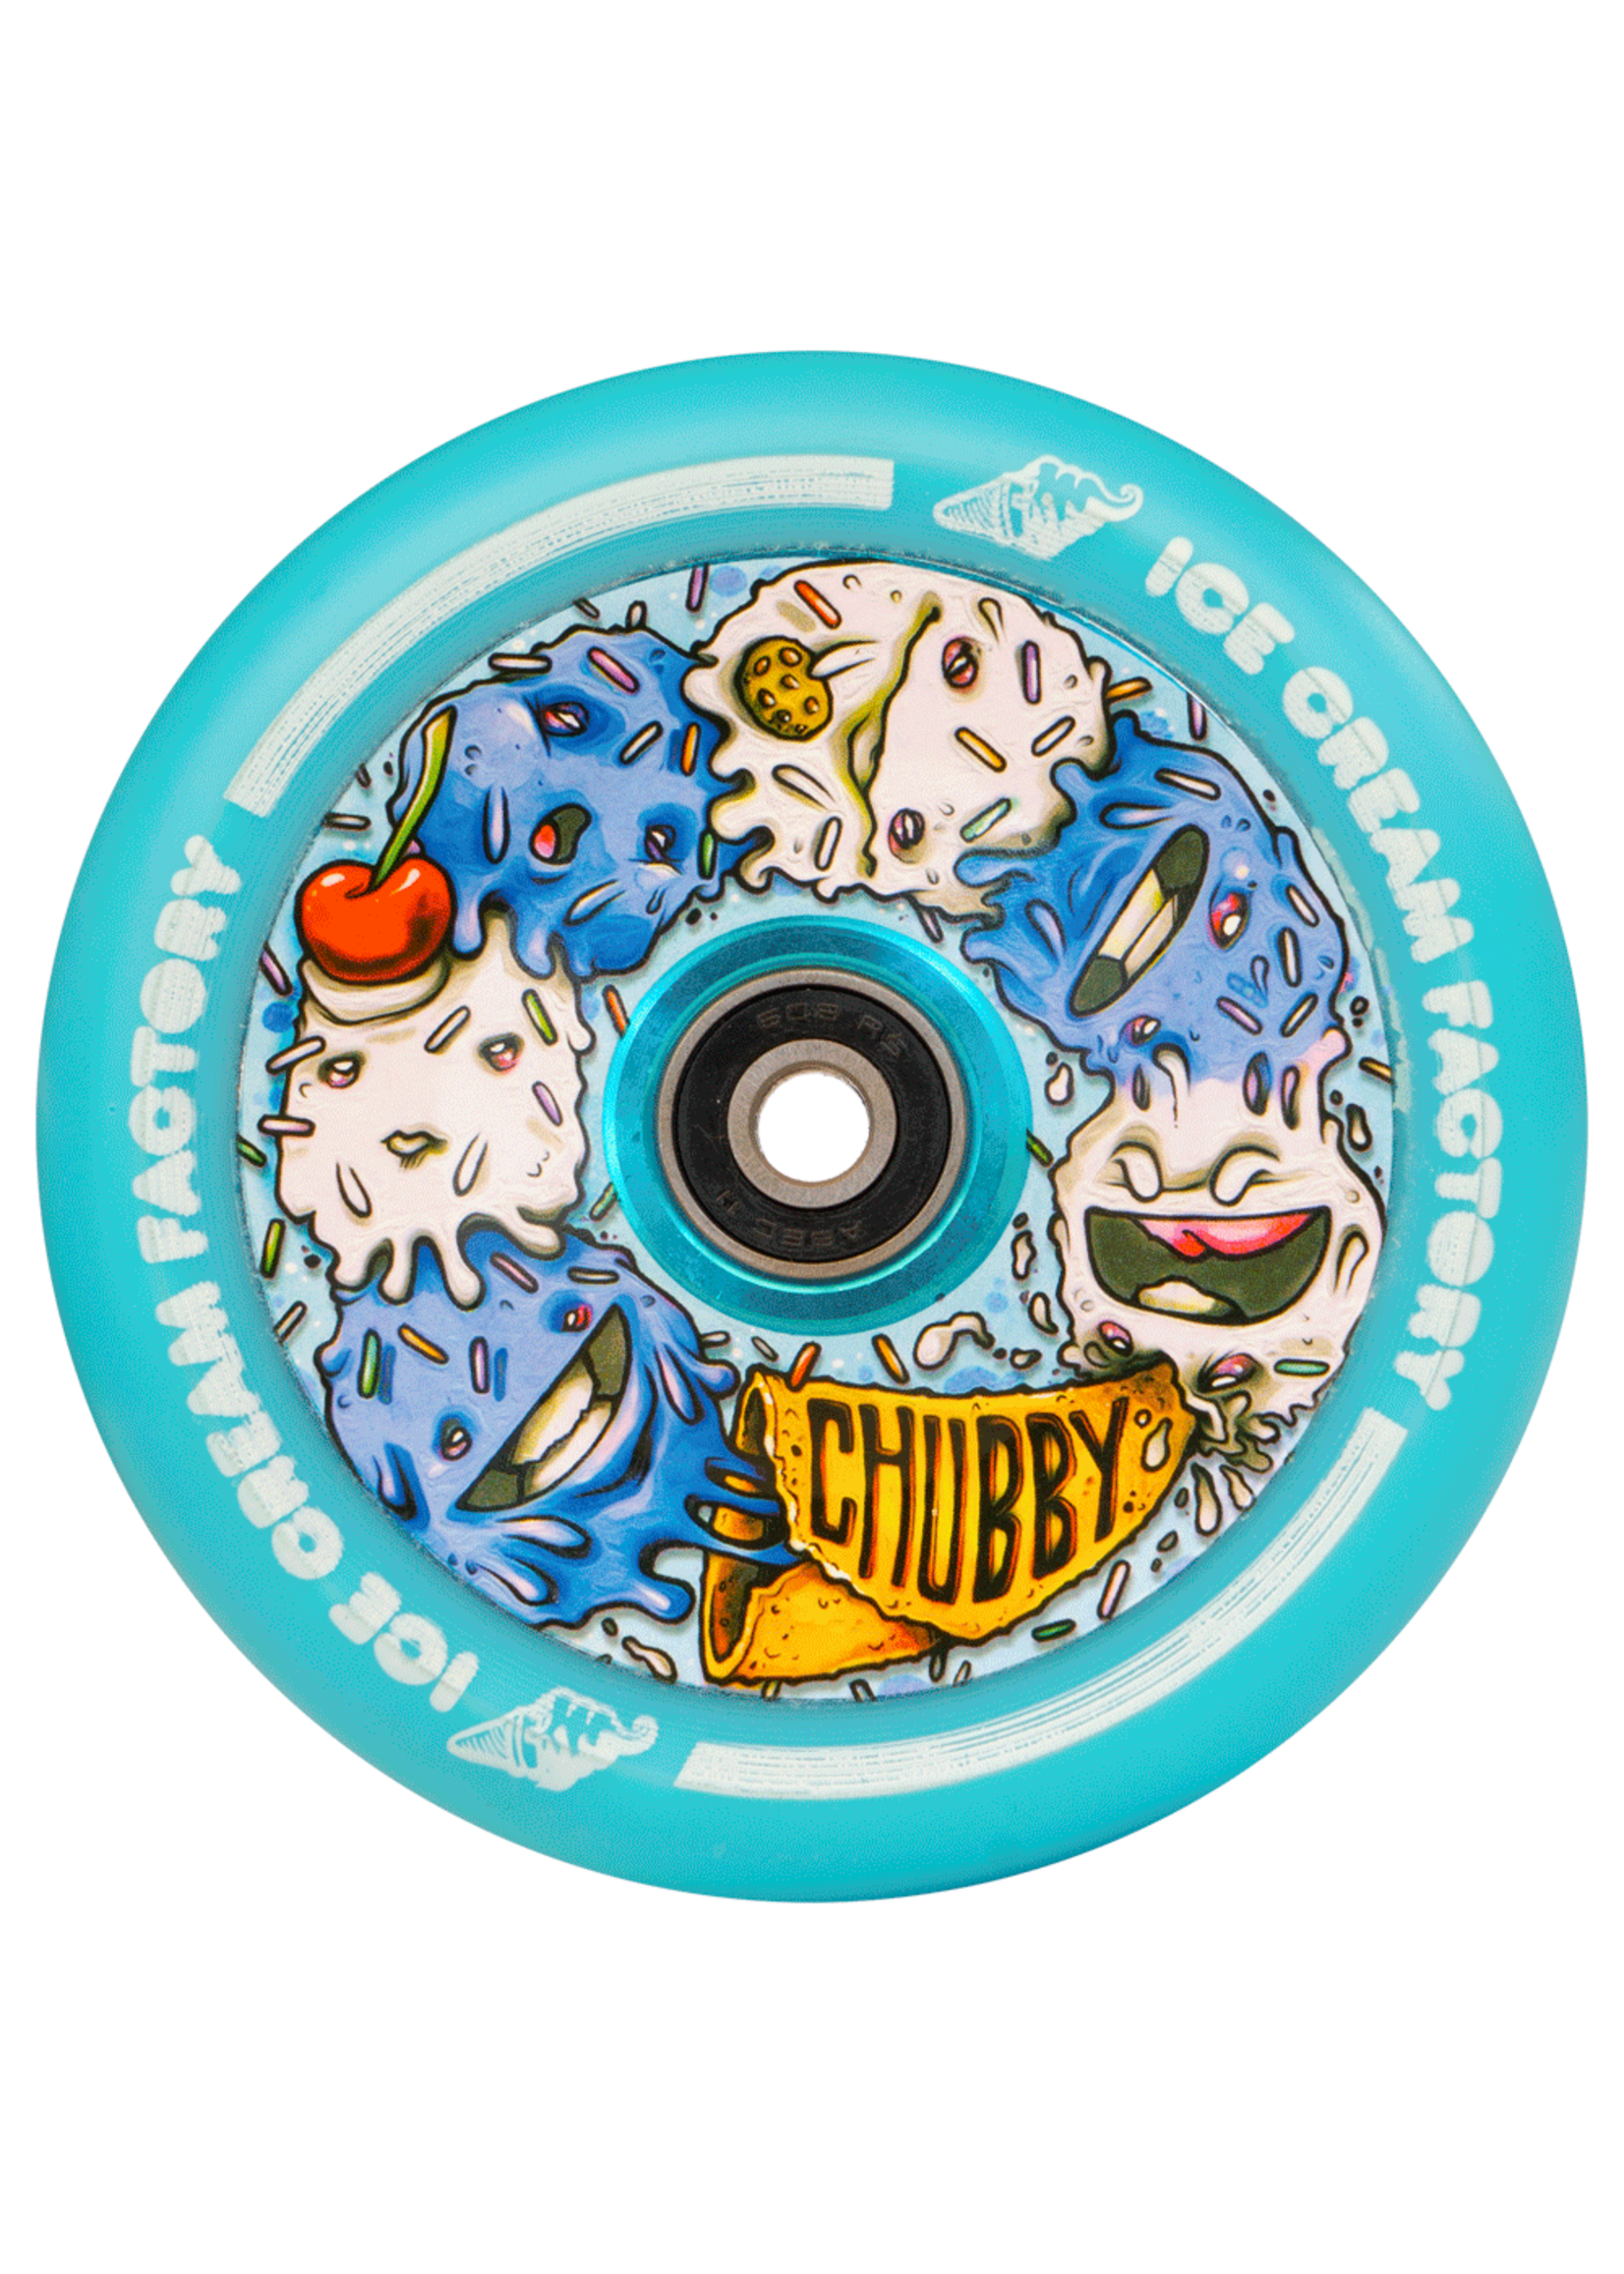 Chubby Chubby - Melo Wheels - 110mm